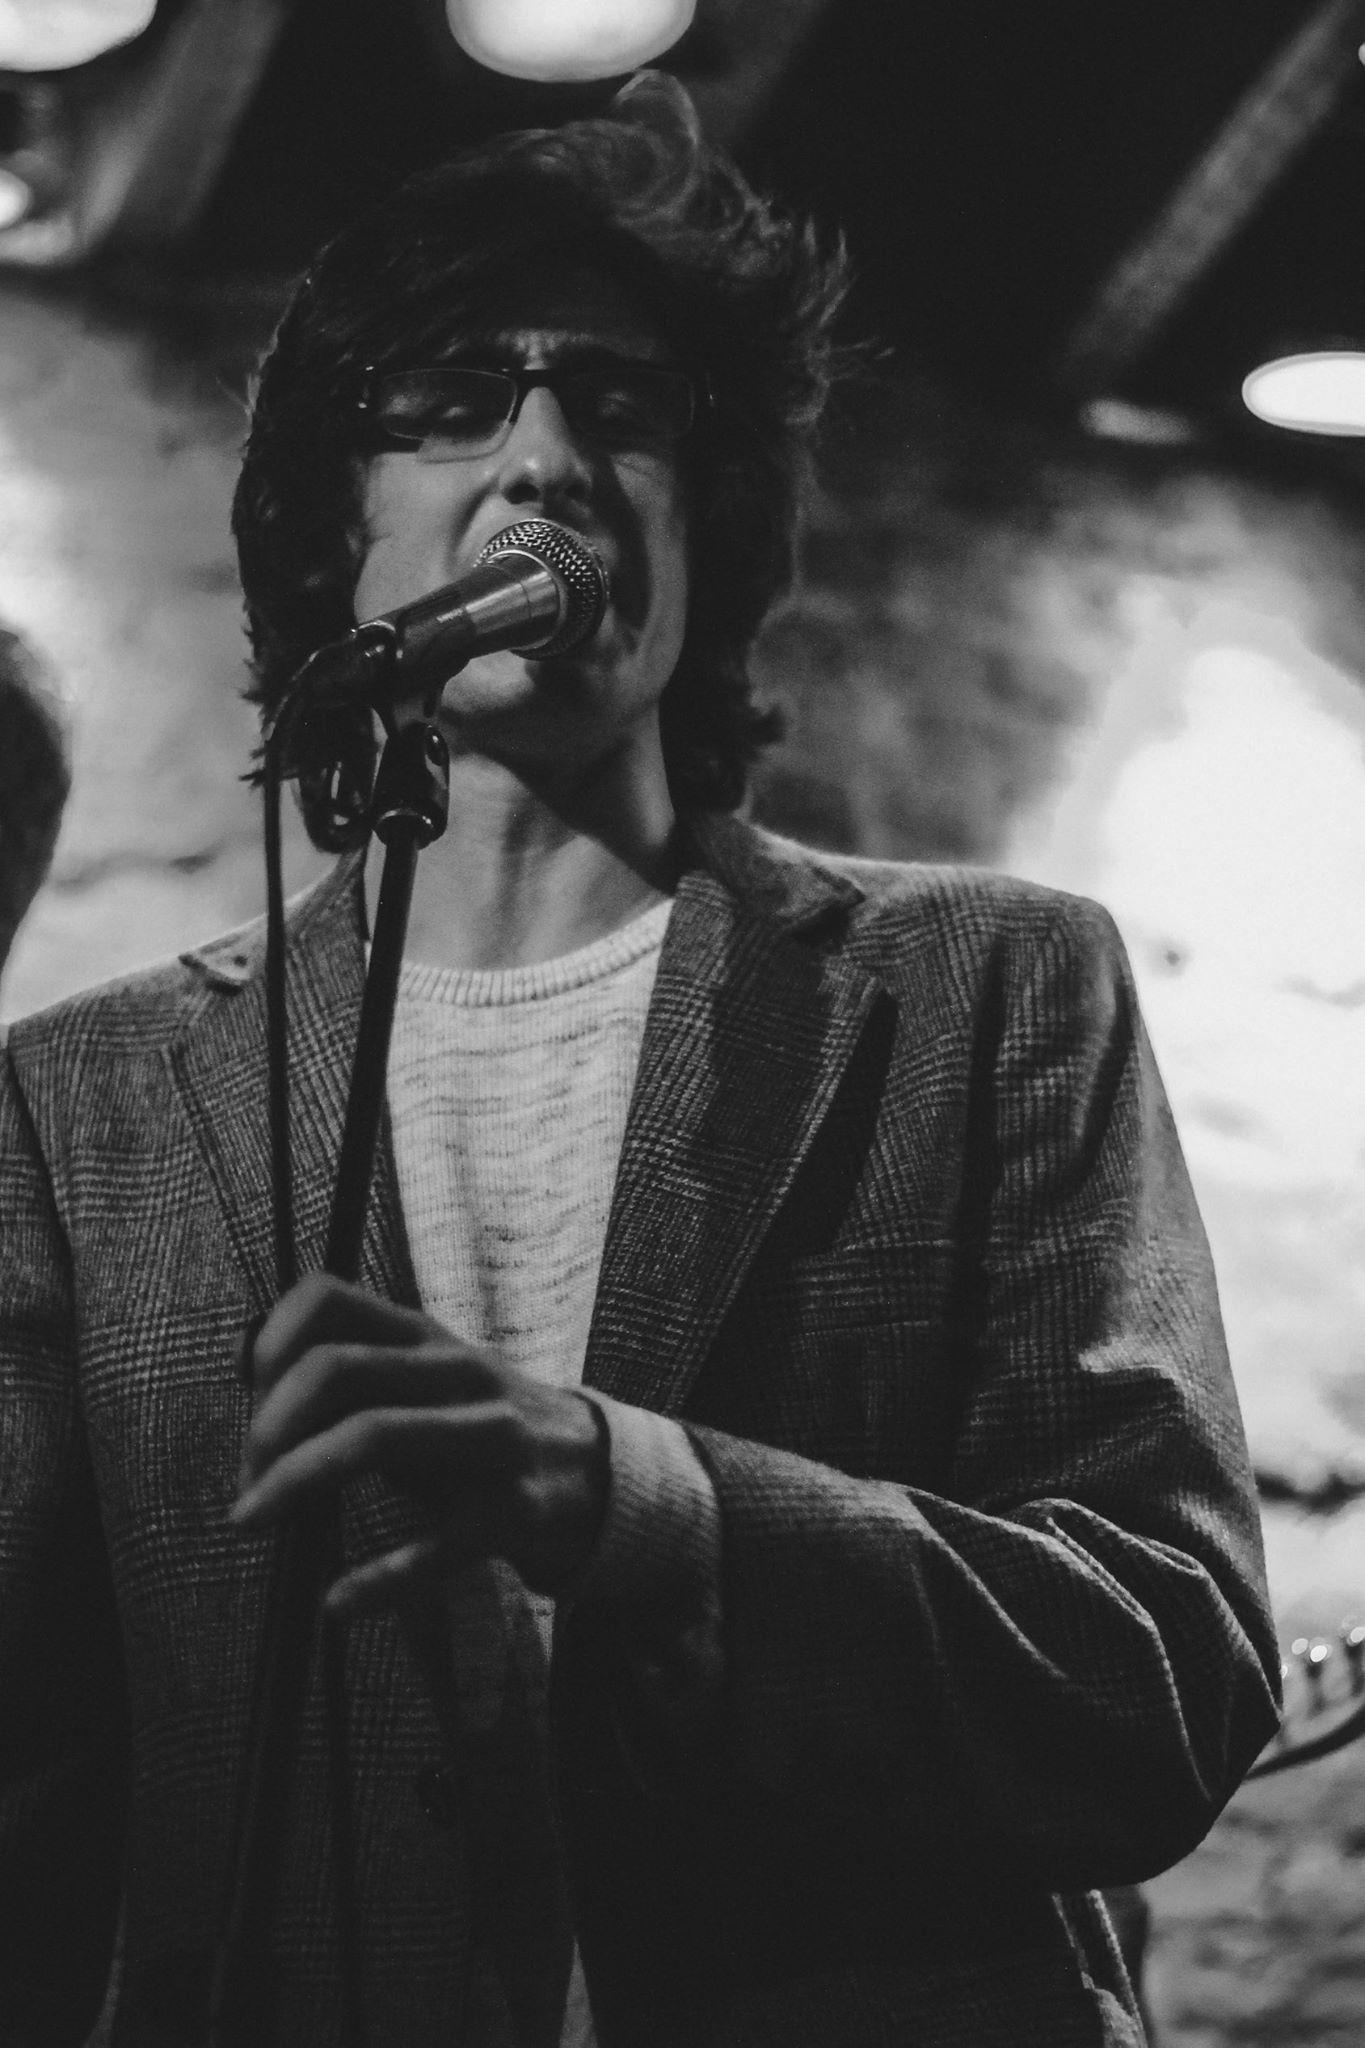 Photo by Emma Noelle